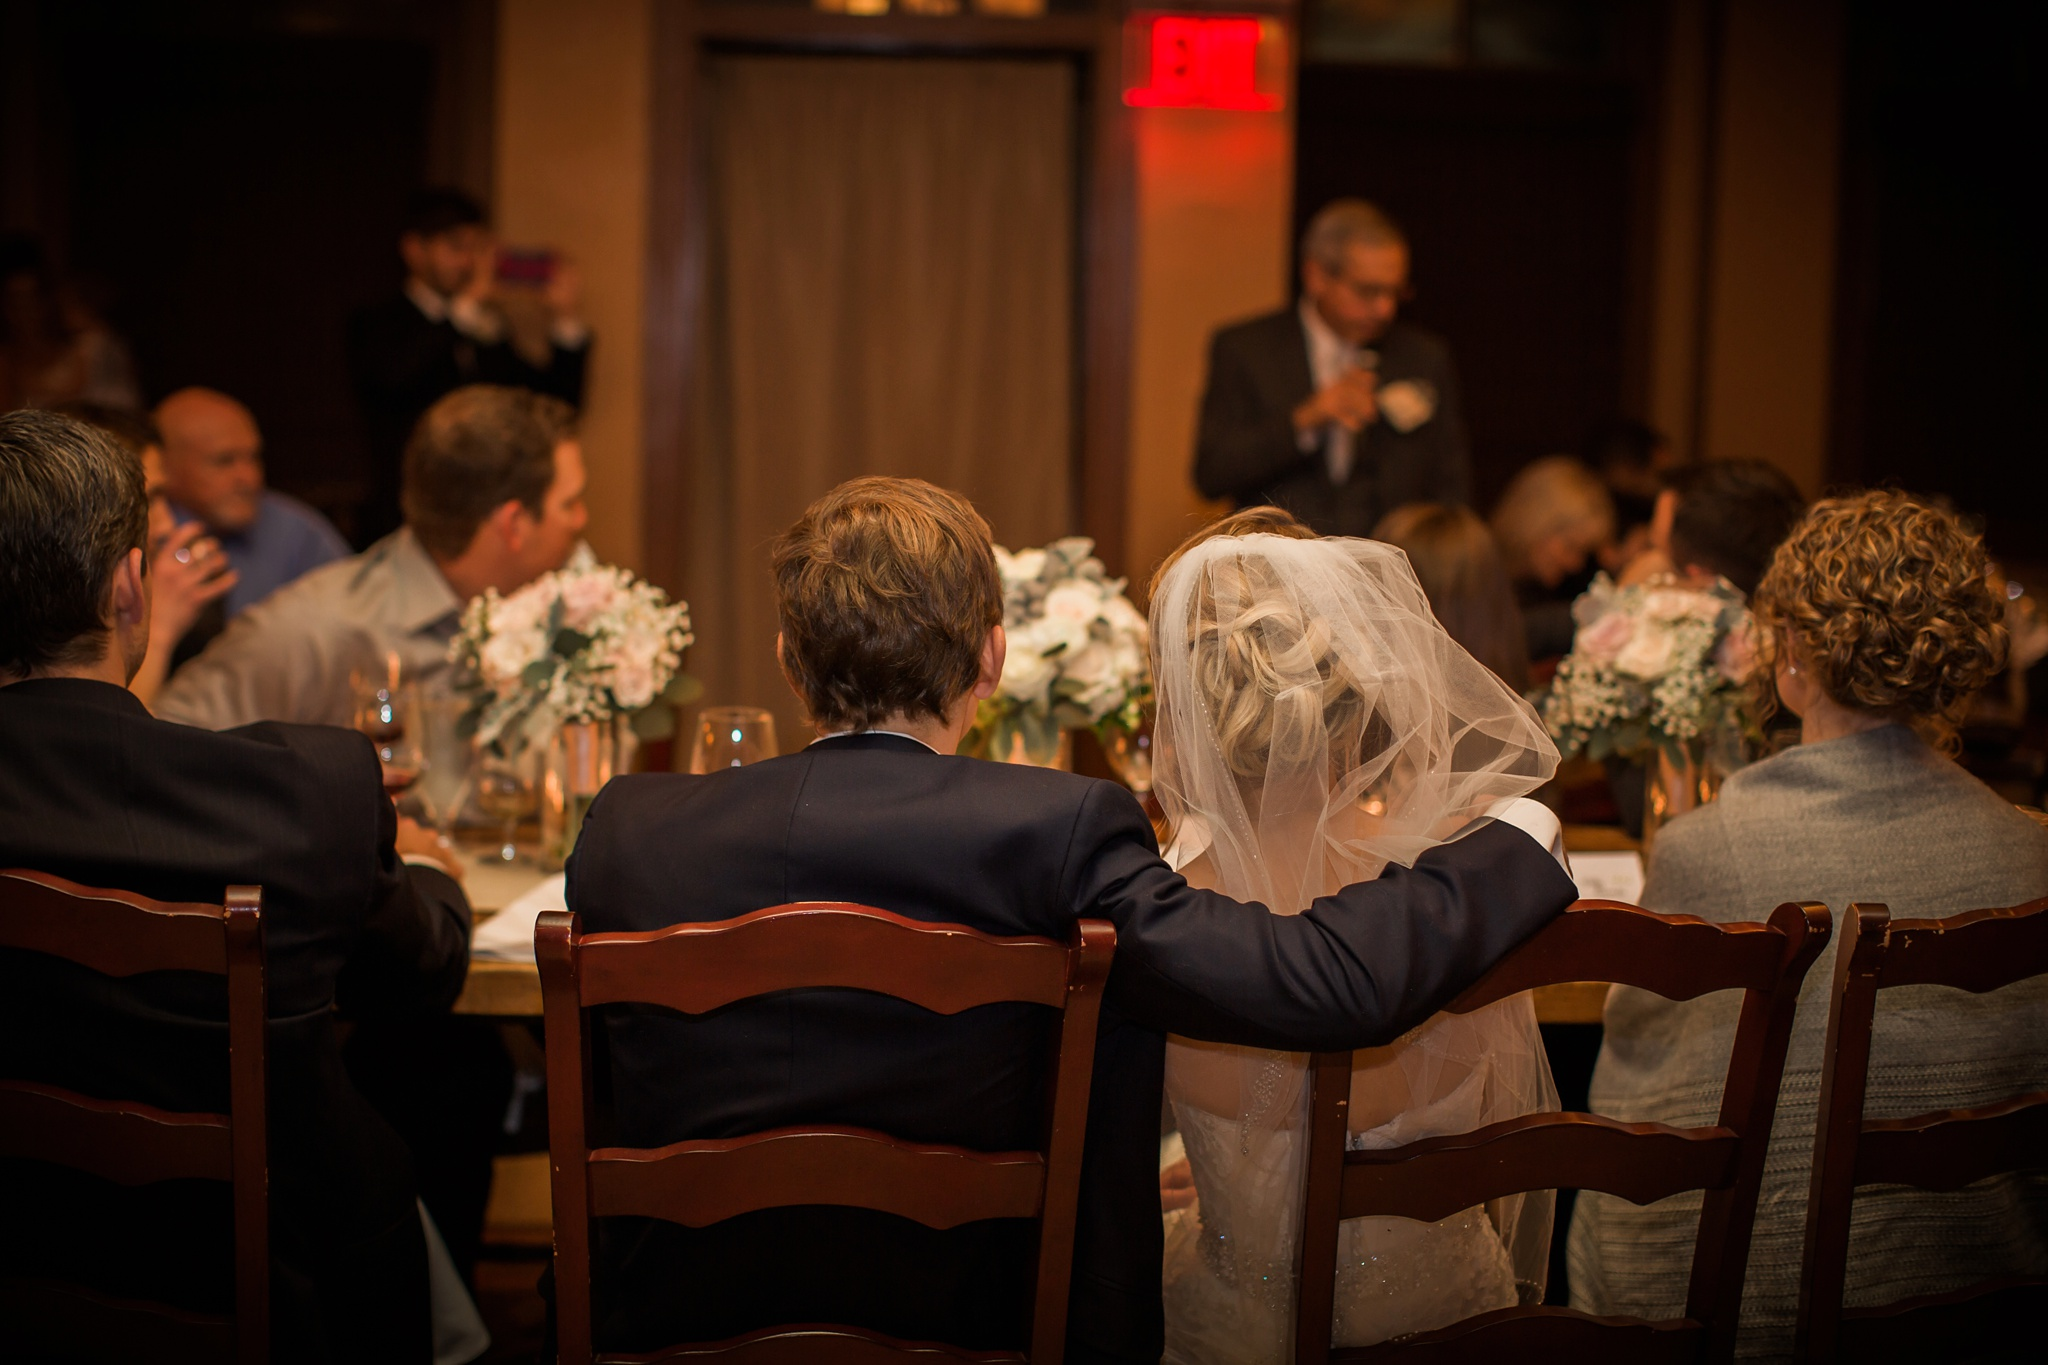 St. Louis Wedding Photographer   Chandler Rose Photography_0062.jpg